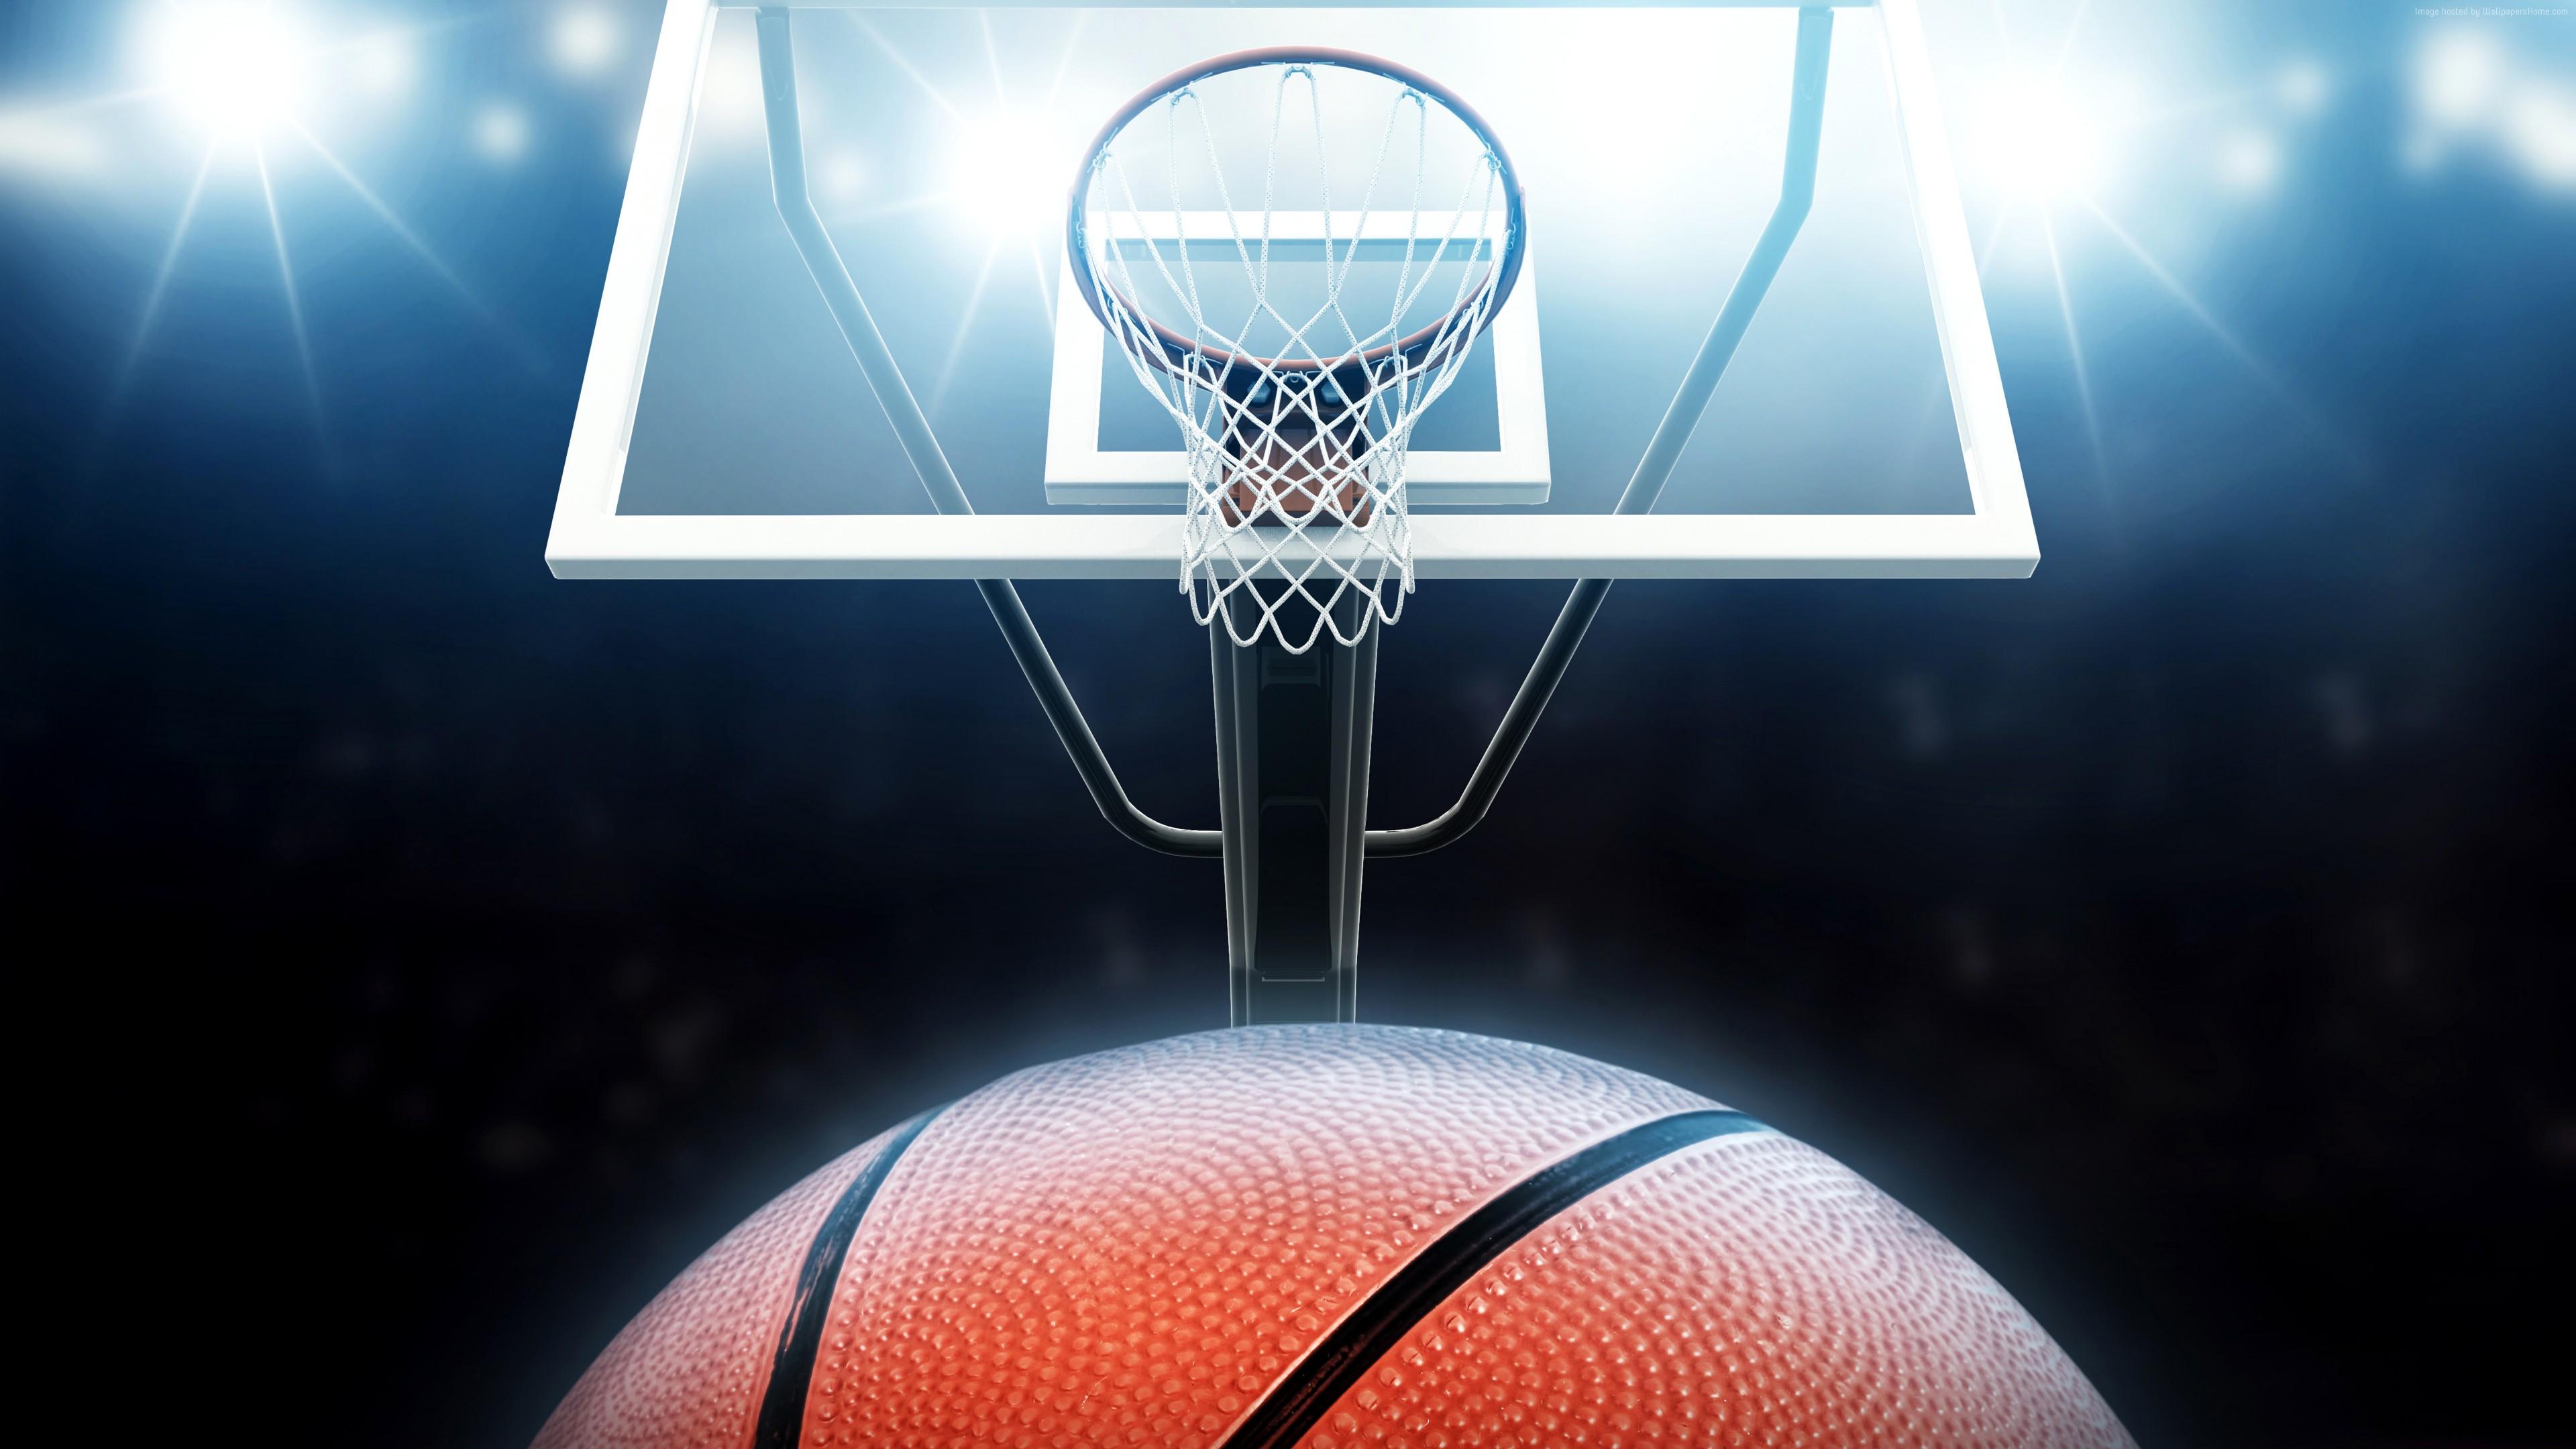 Basketball 4k (1400x900 Resolution)